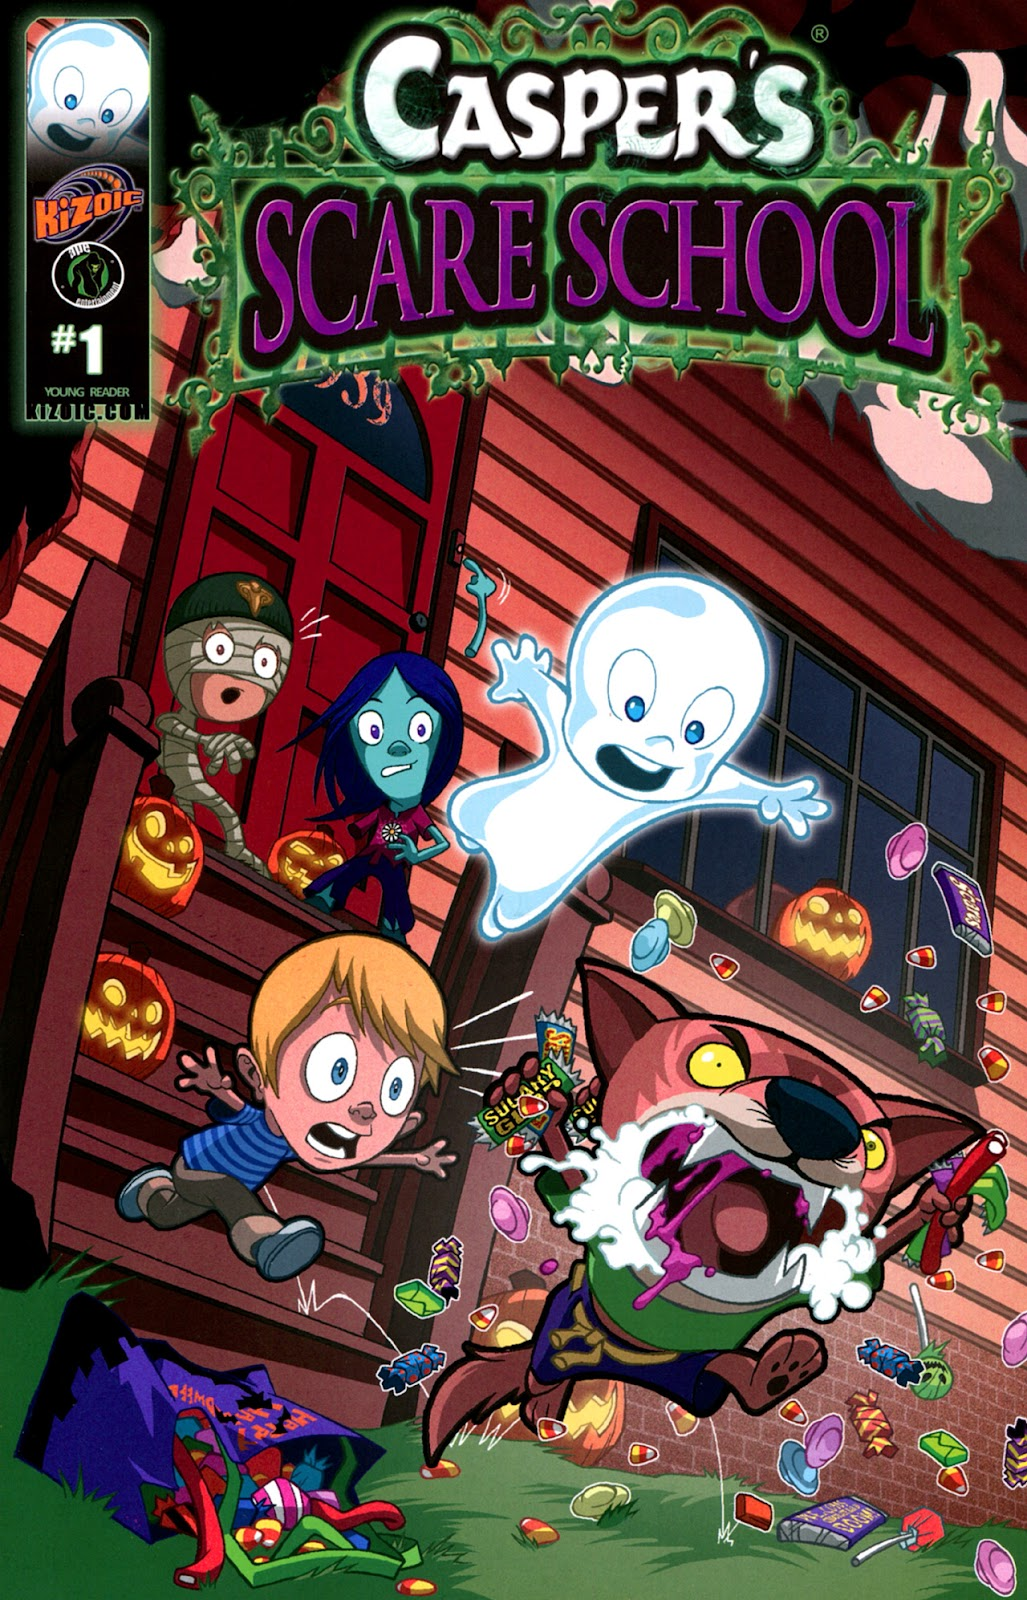 Read online Casper's Scare School comic -  Issue #1 - 1